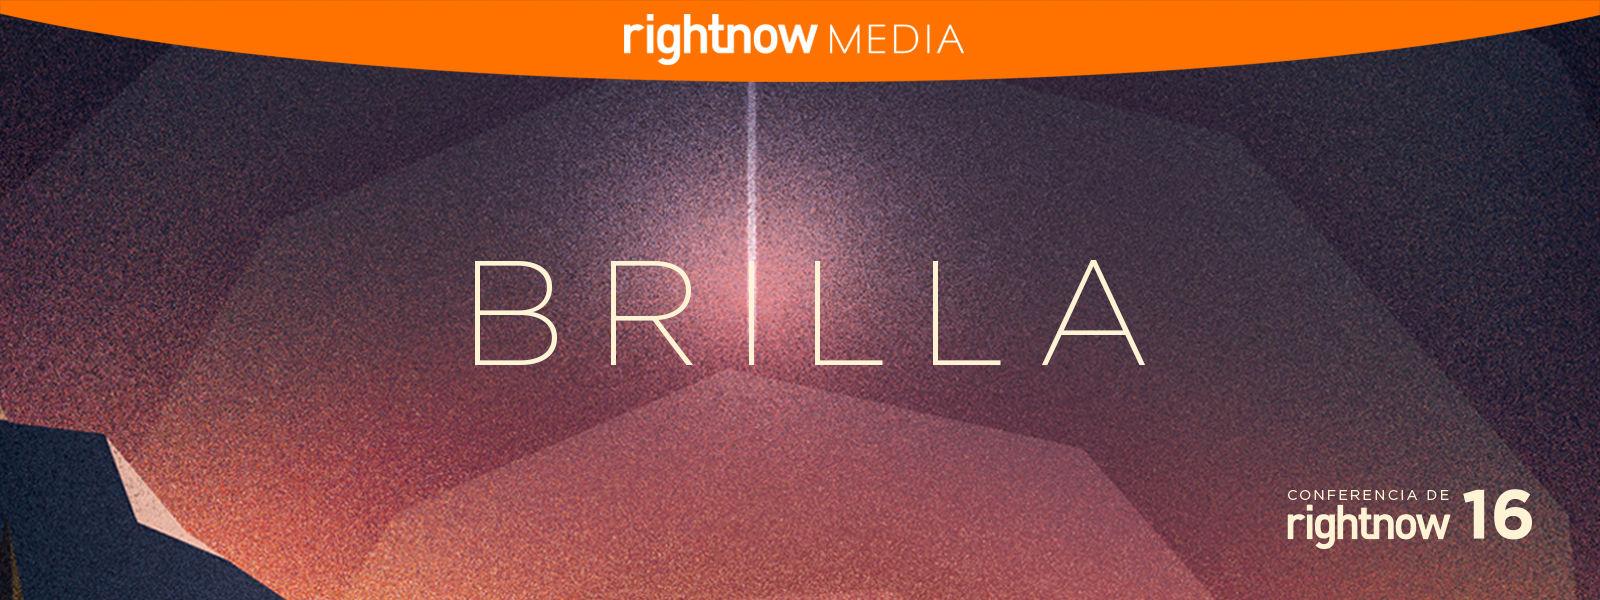 BRILLA conferencia de RightNow